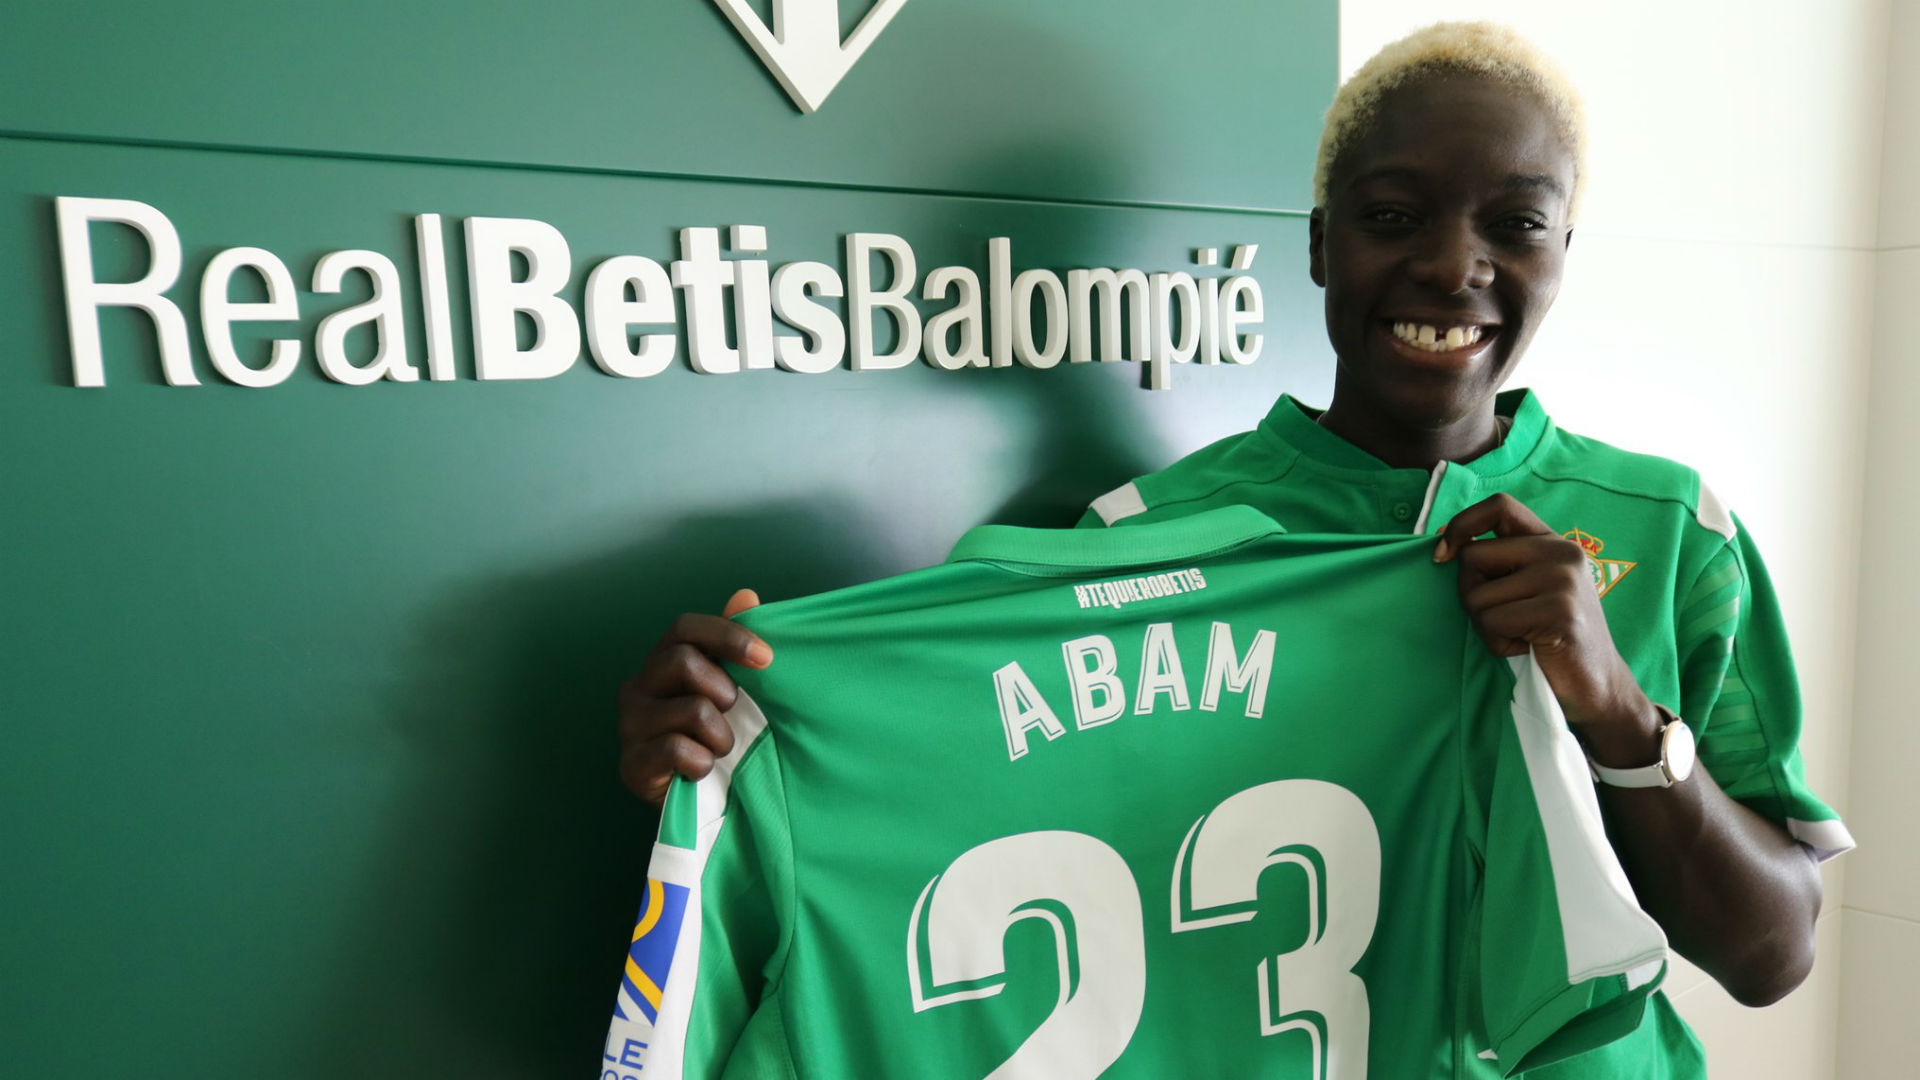 Michaela Abam opens Real Betis goal account against Deportivo de La Coruna